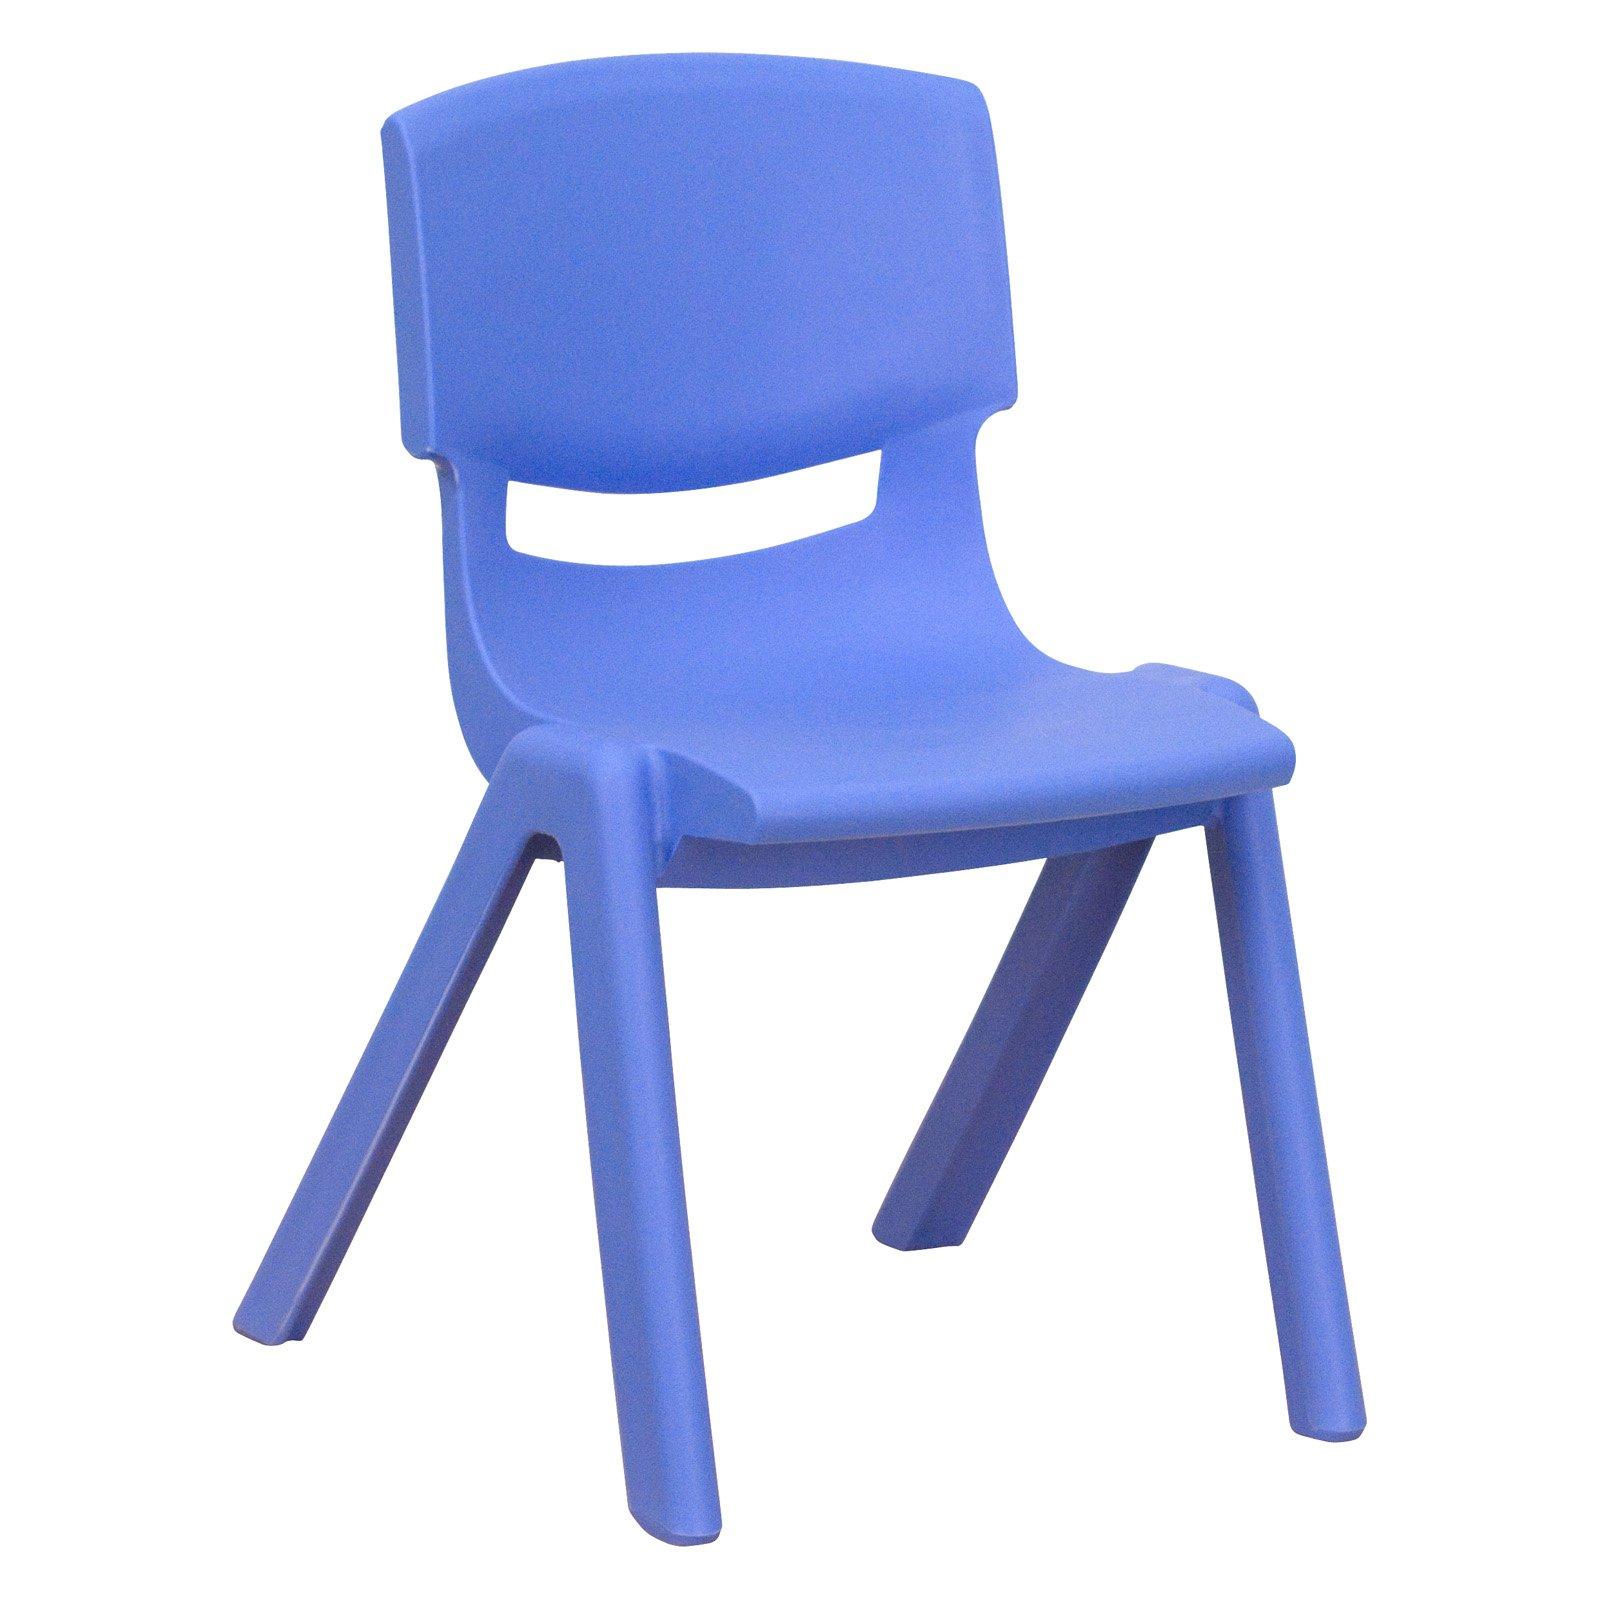 Plastic Stackable School Chair Blue Flash Furniture School